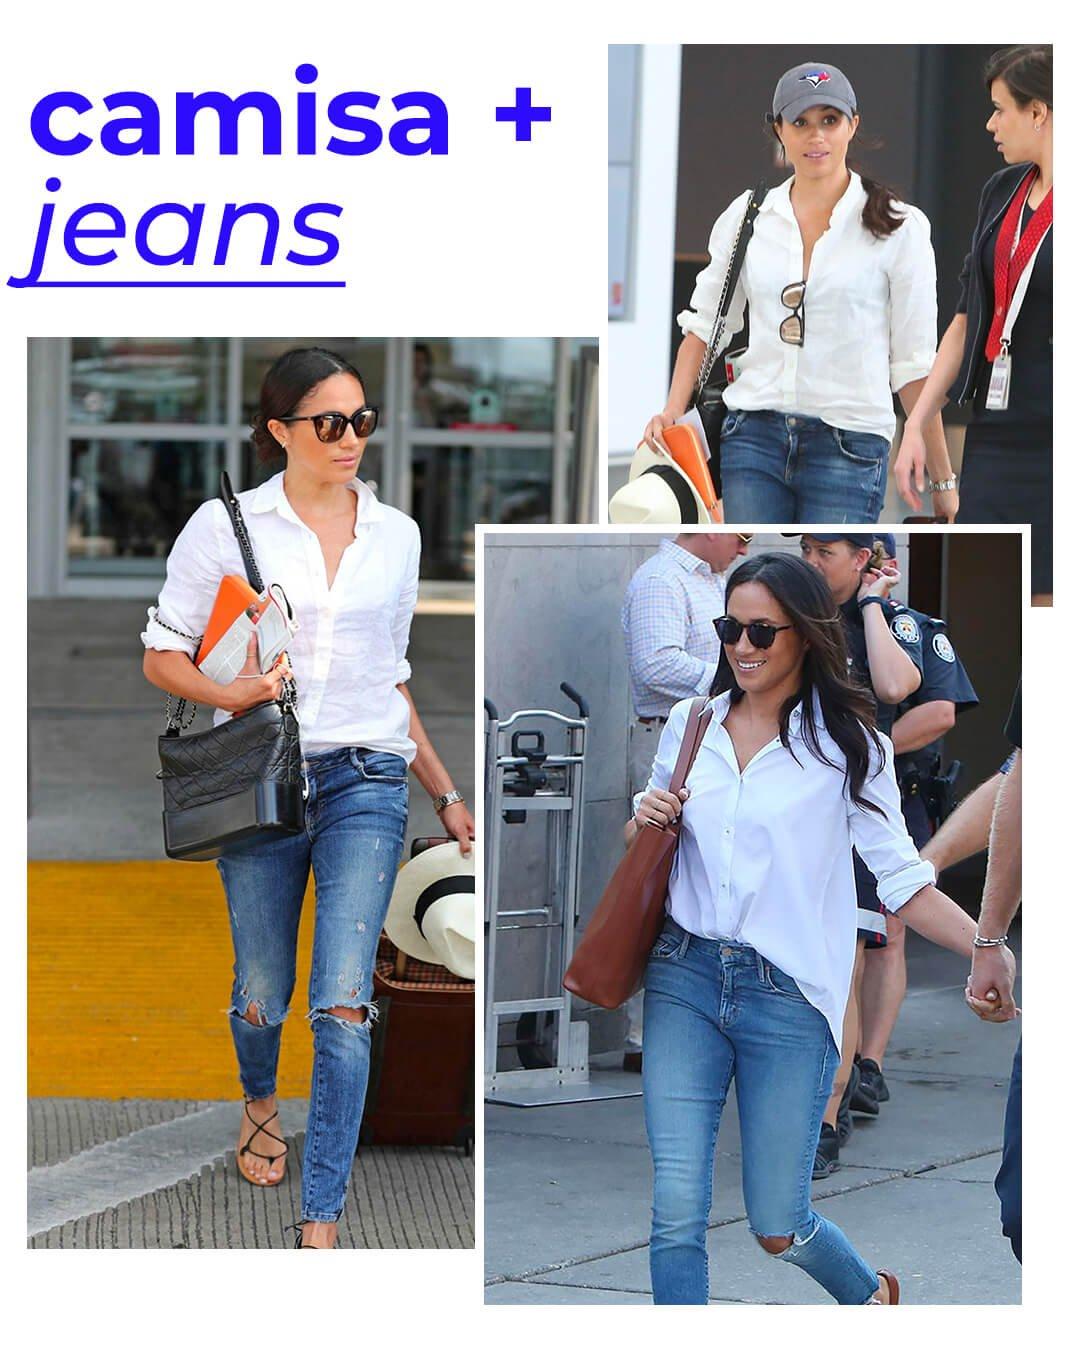 It girls - Camisa - Calça Jeans - Verão - Street Style - https://stealthelook.com.br